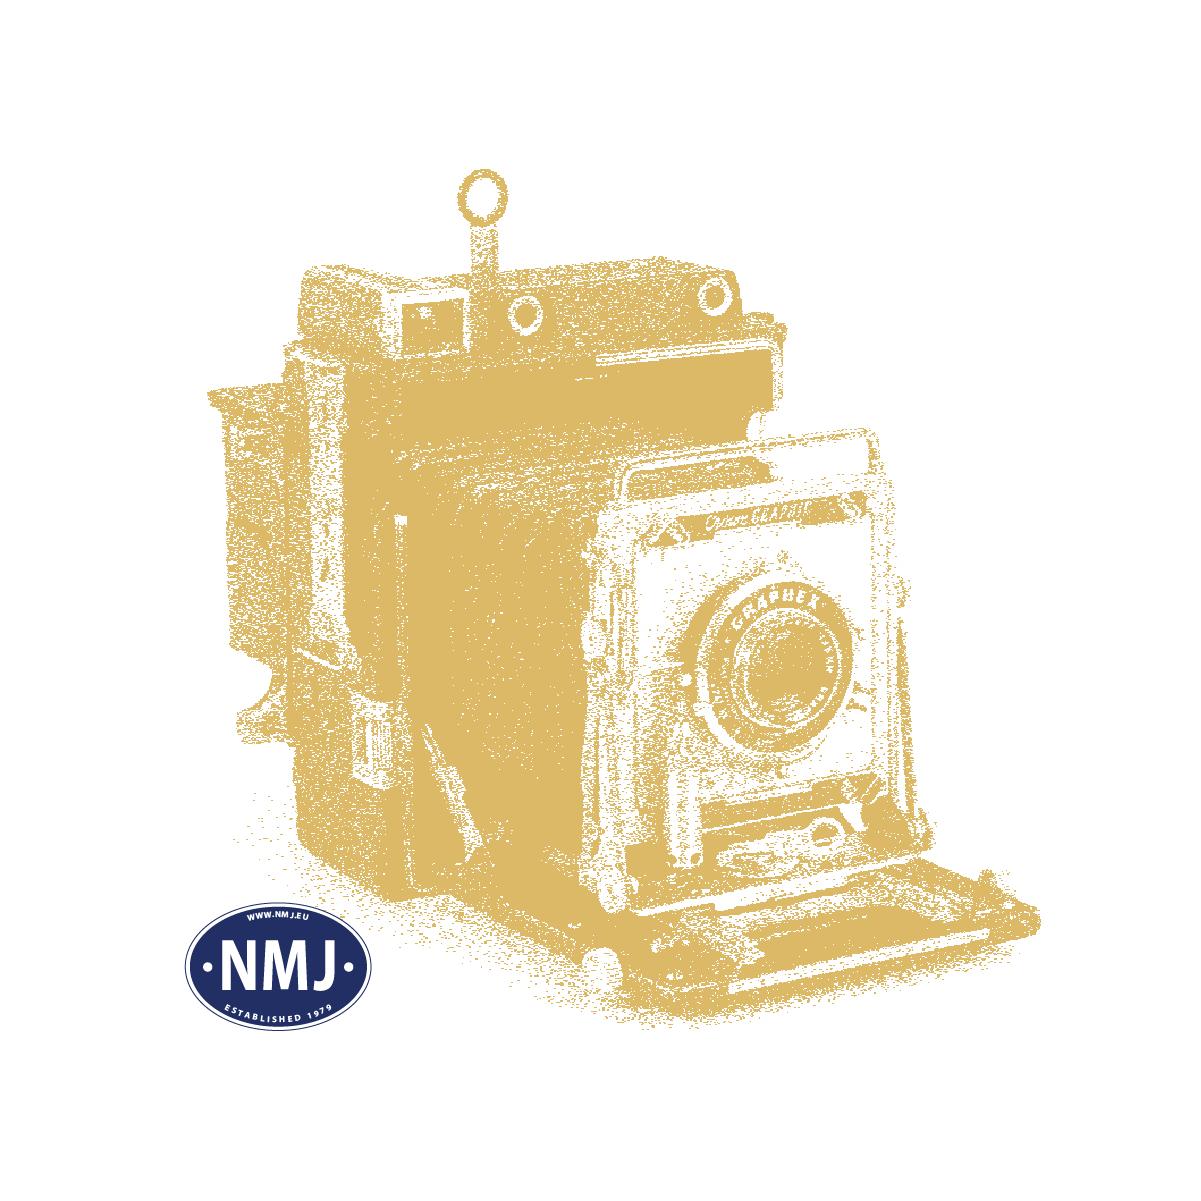 NMJT105.301 - NMJ Topline NSB A2 24002 Nydesign